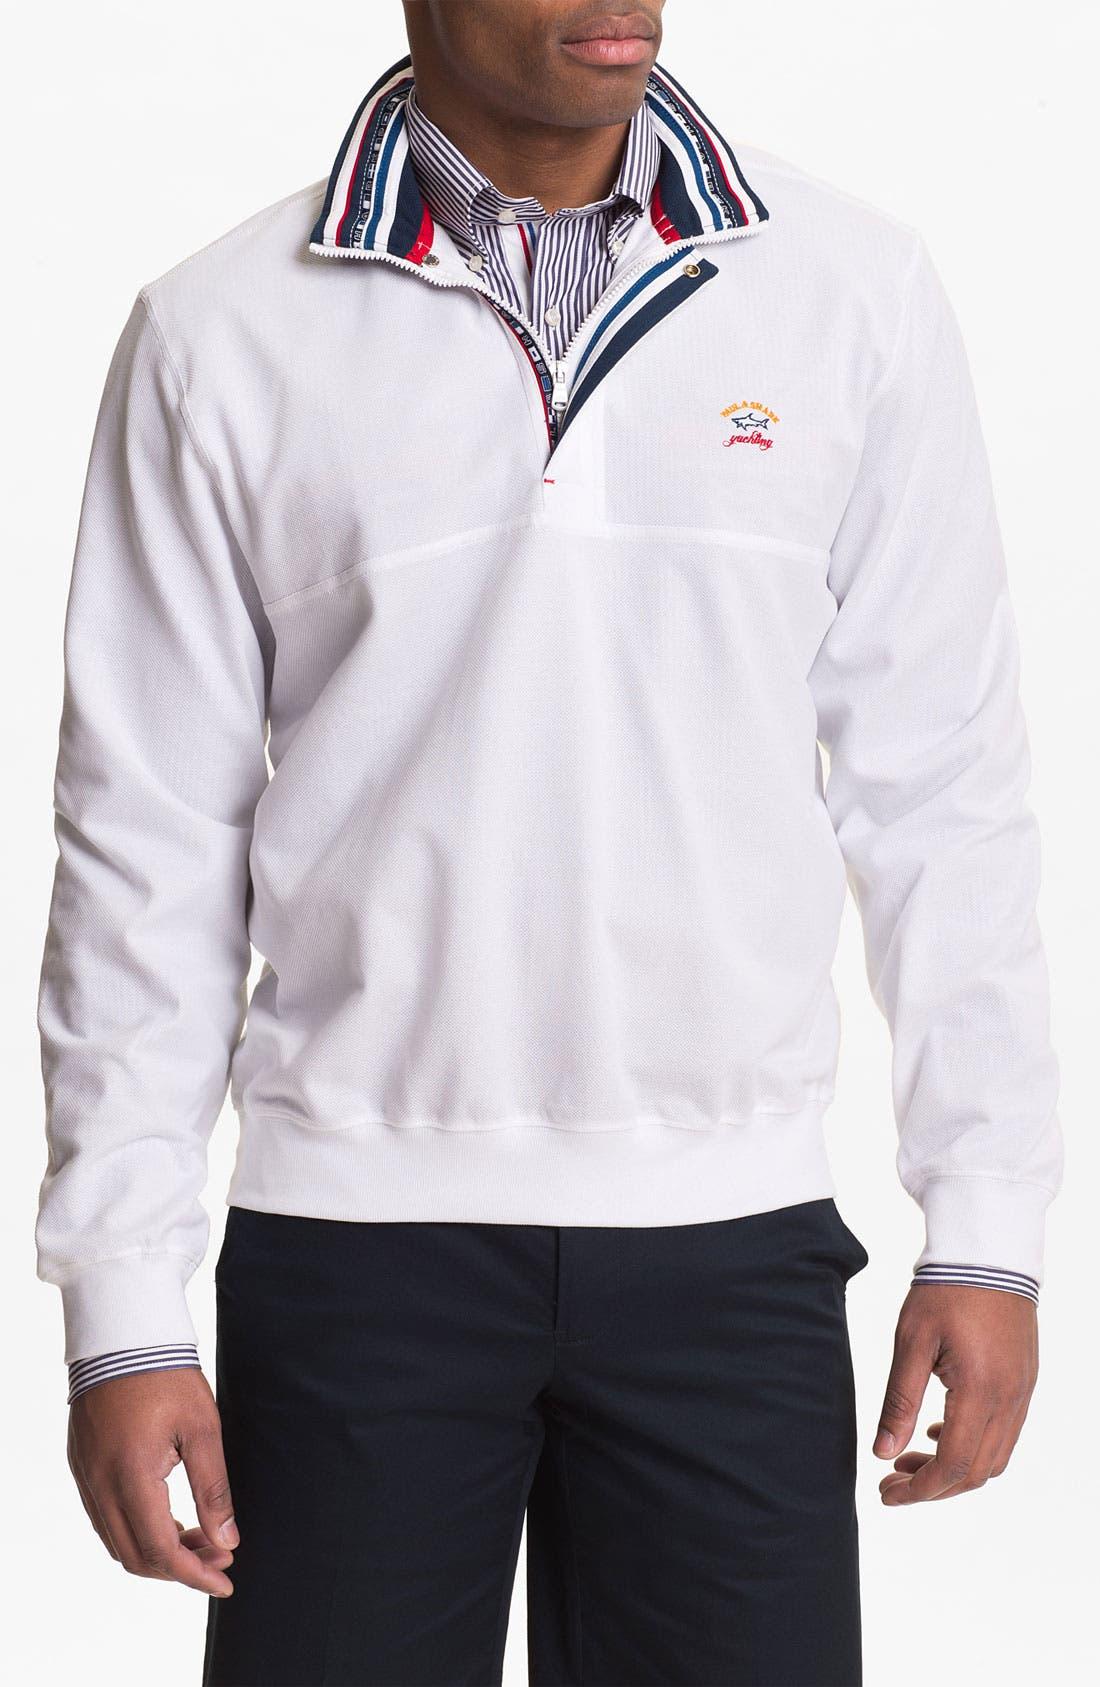 Alternate Image 1 Selected - Paul & Shark Quarter Zip Pique Sweater